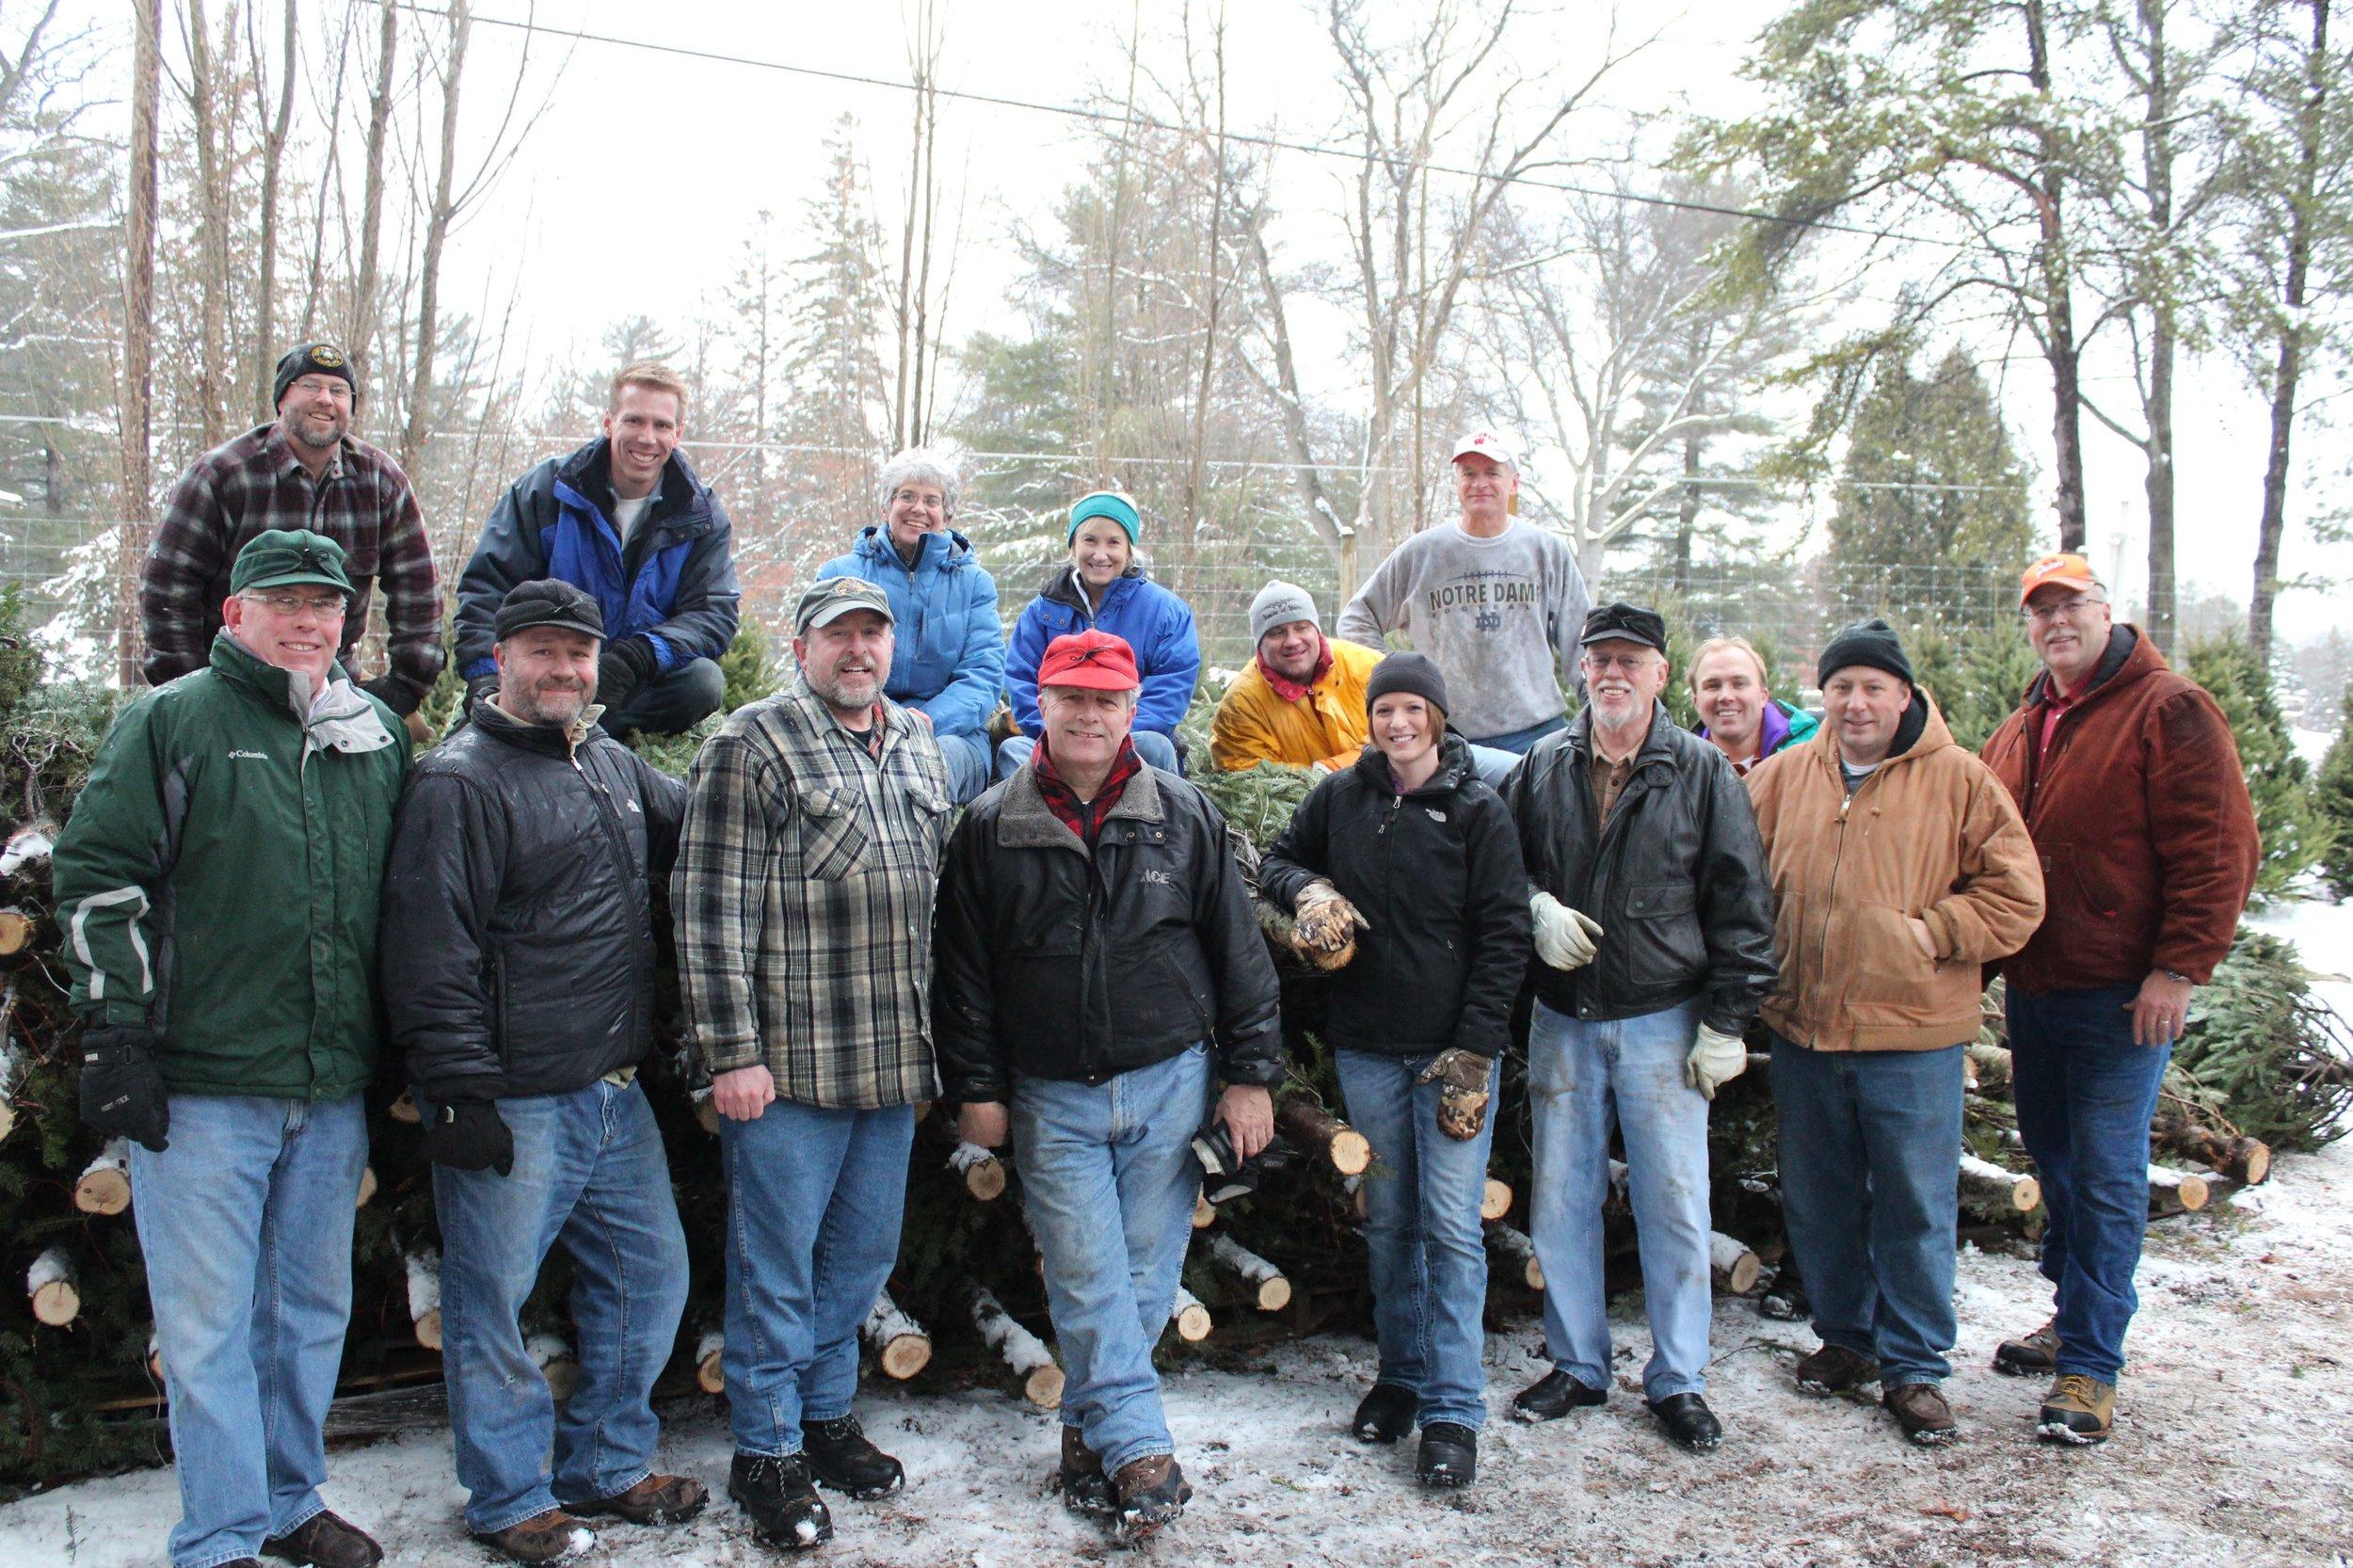 Lakeland (Minocqua) Noon Rotary Christmas Tree, Wreath & Roping sale